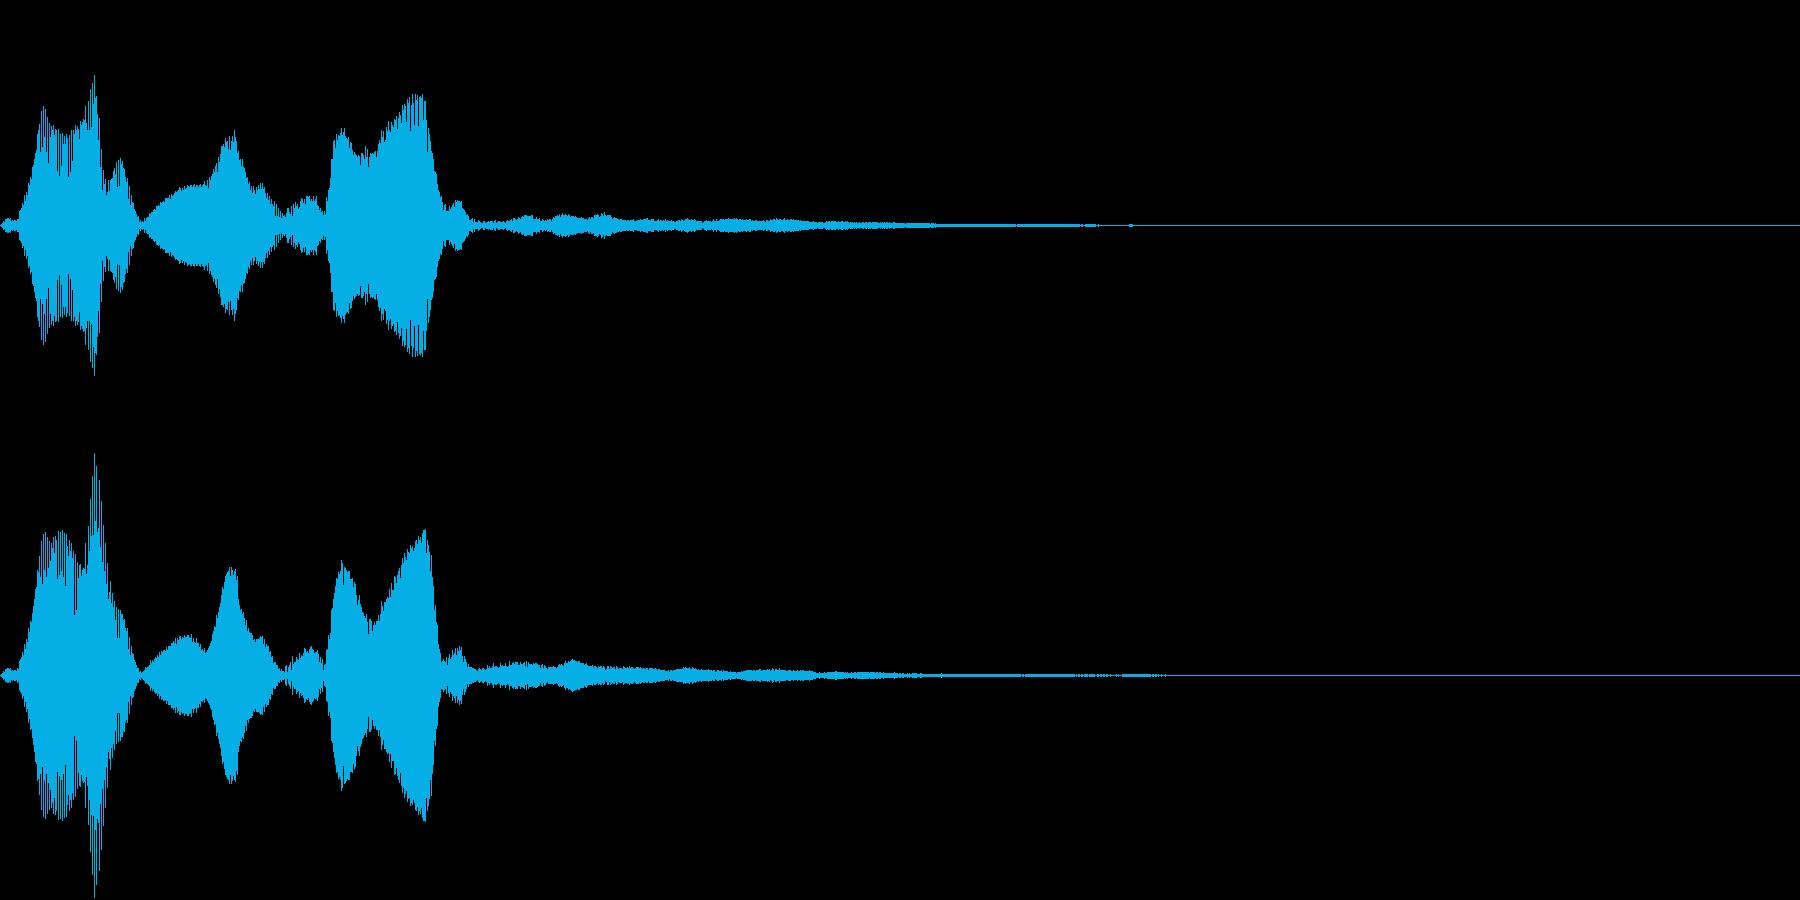 Command 認証・承認 電子音の再生済みの波形